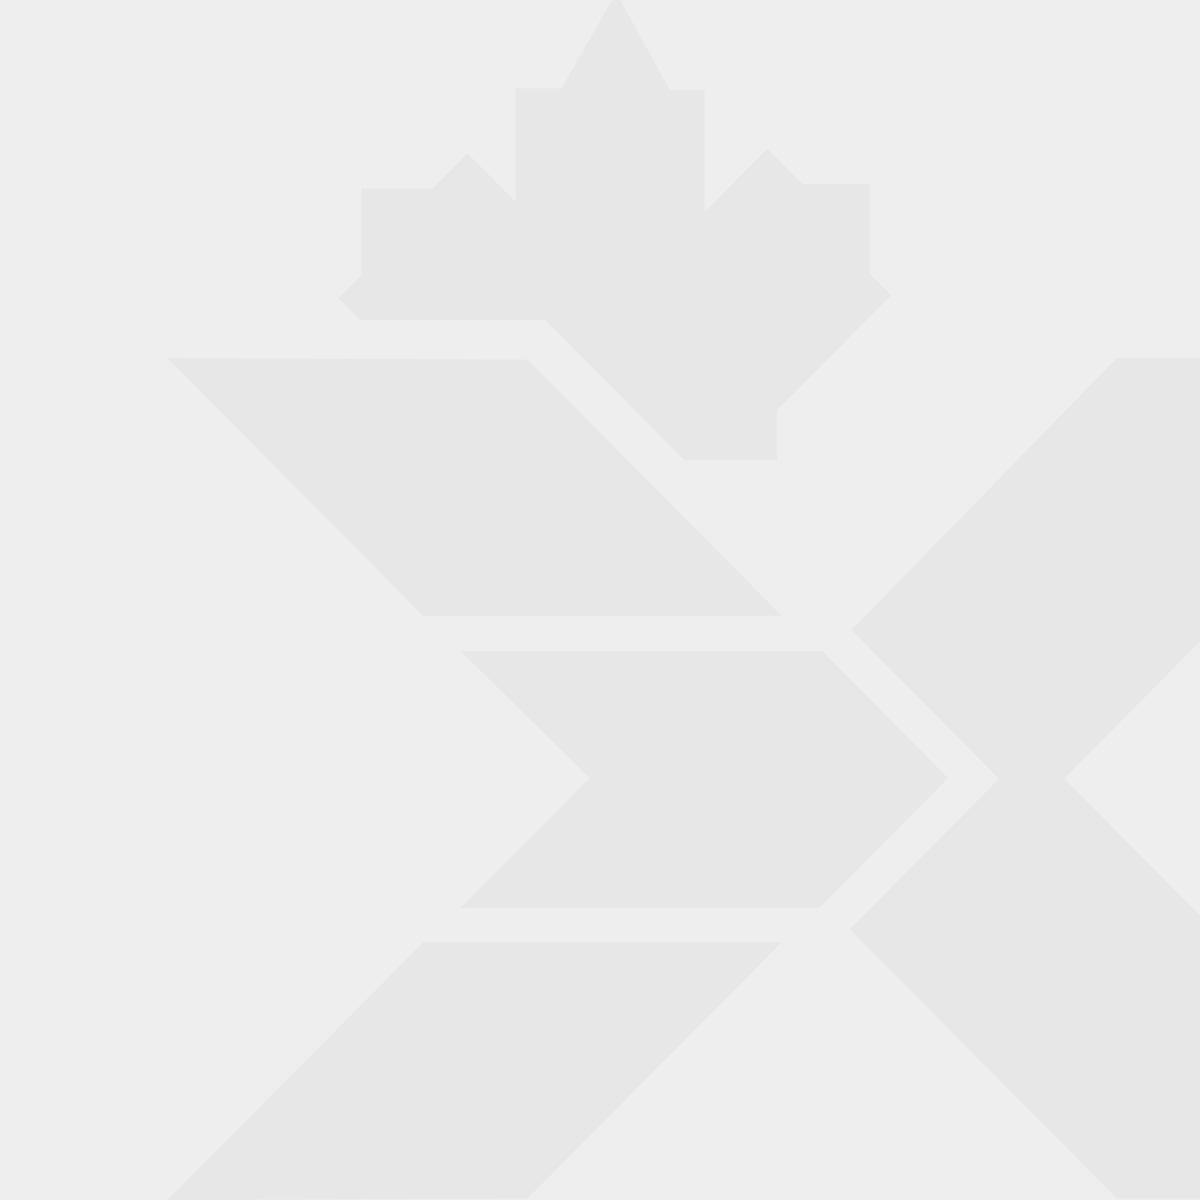 Canadian Army Cufflink & Shirt Stud Combo Set